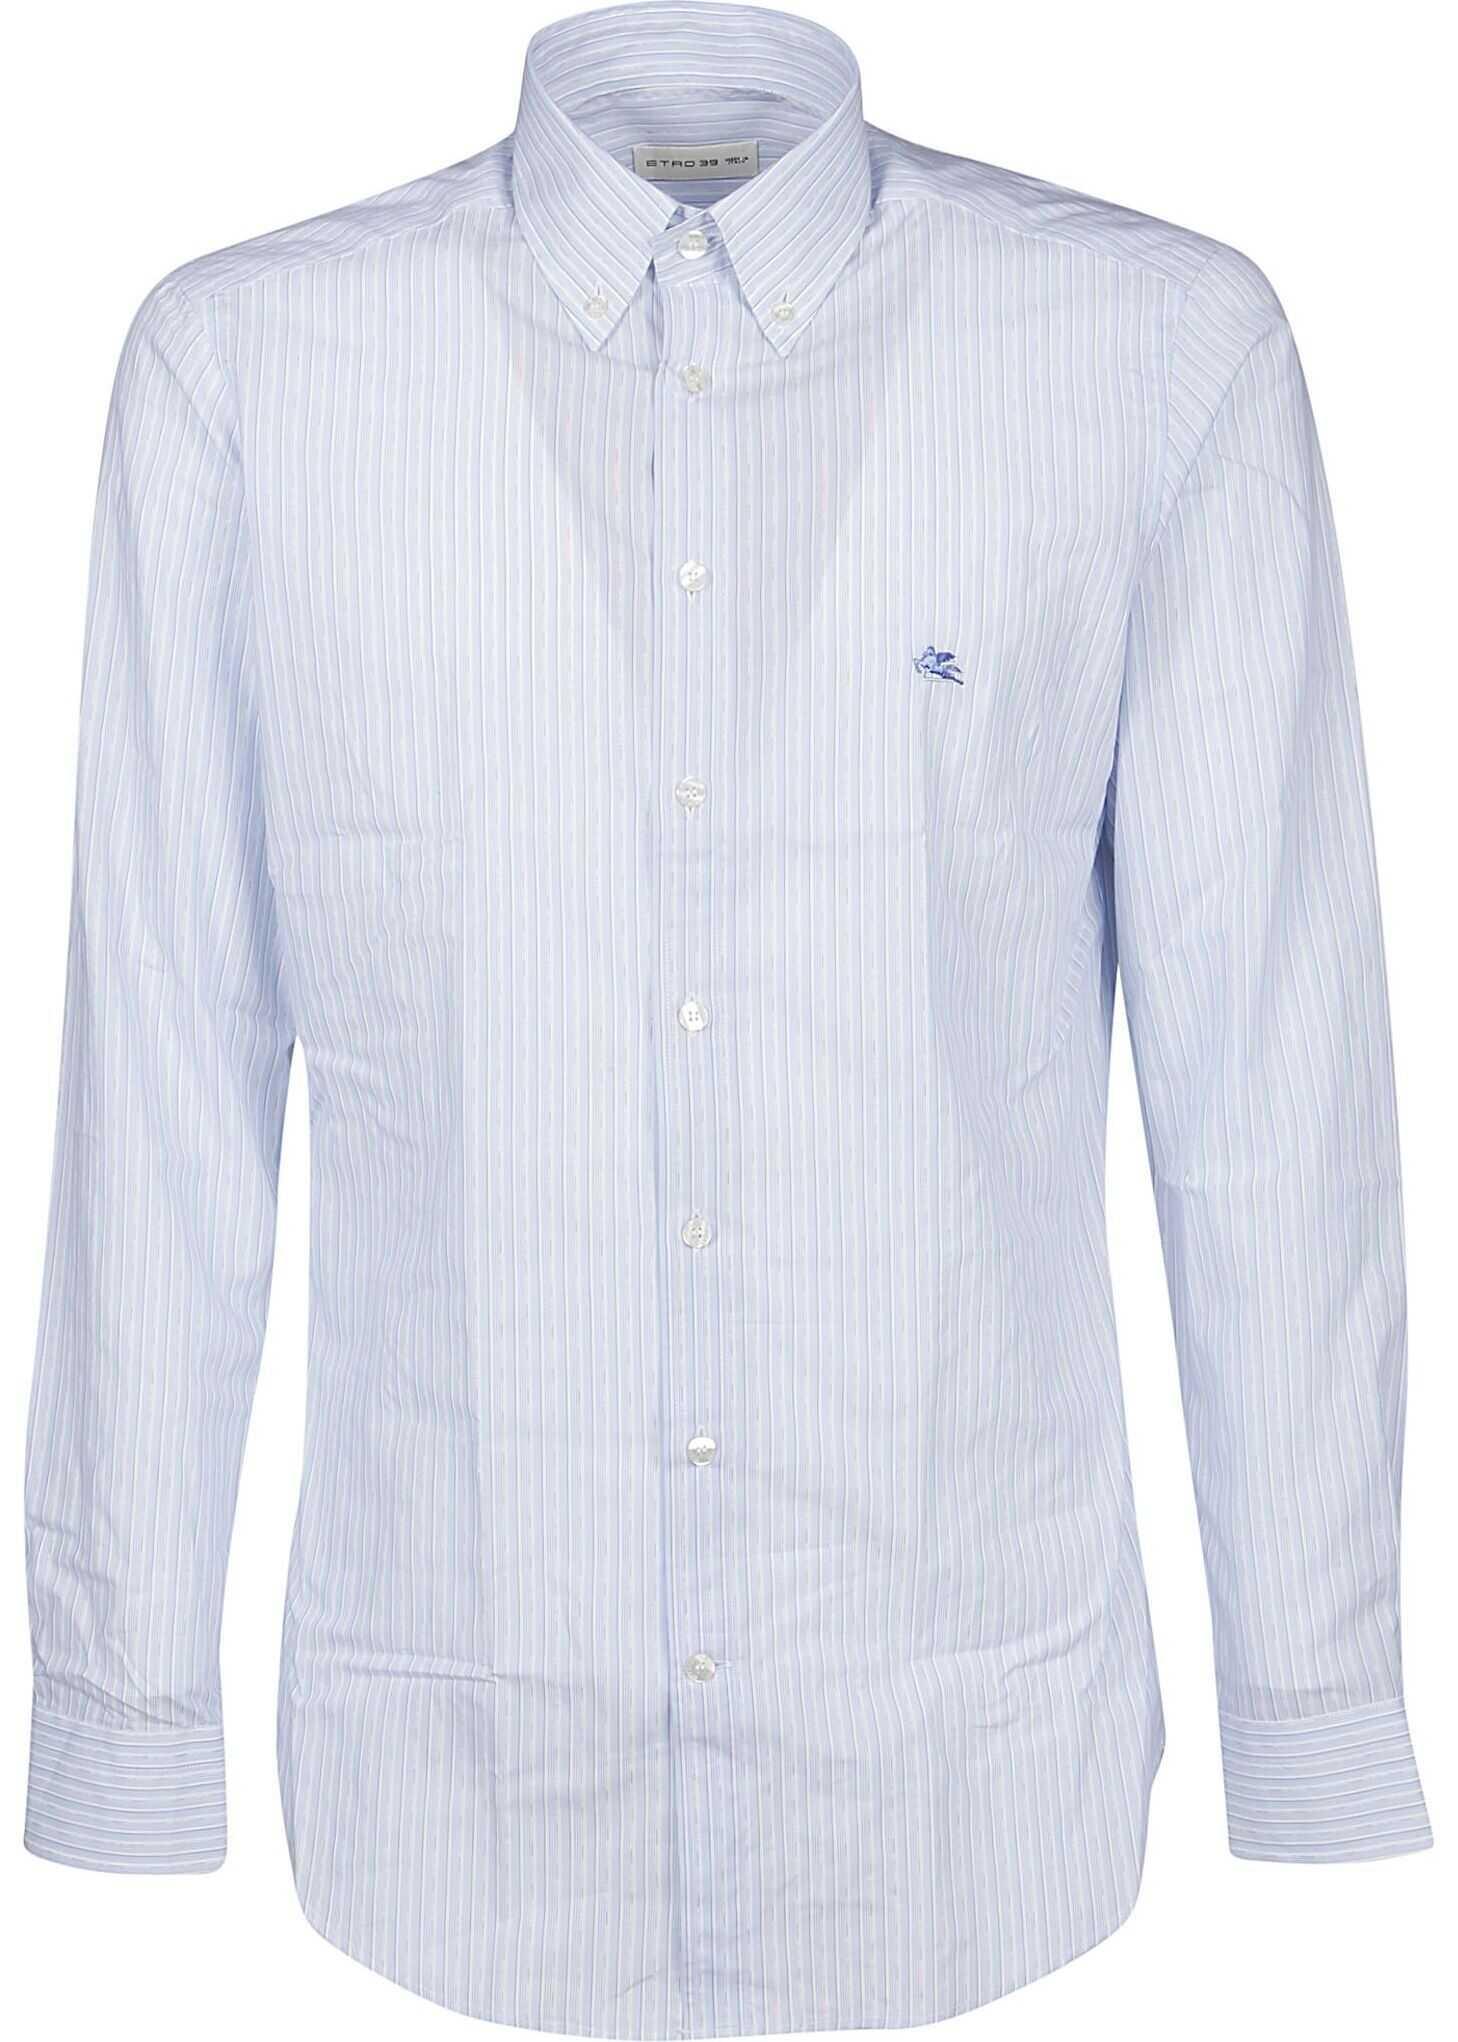 ETRO Cotton Shirt LIGHT BLUE